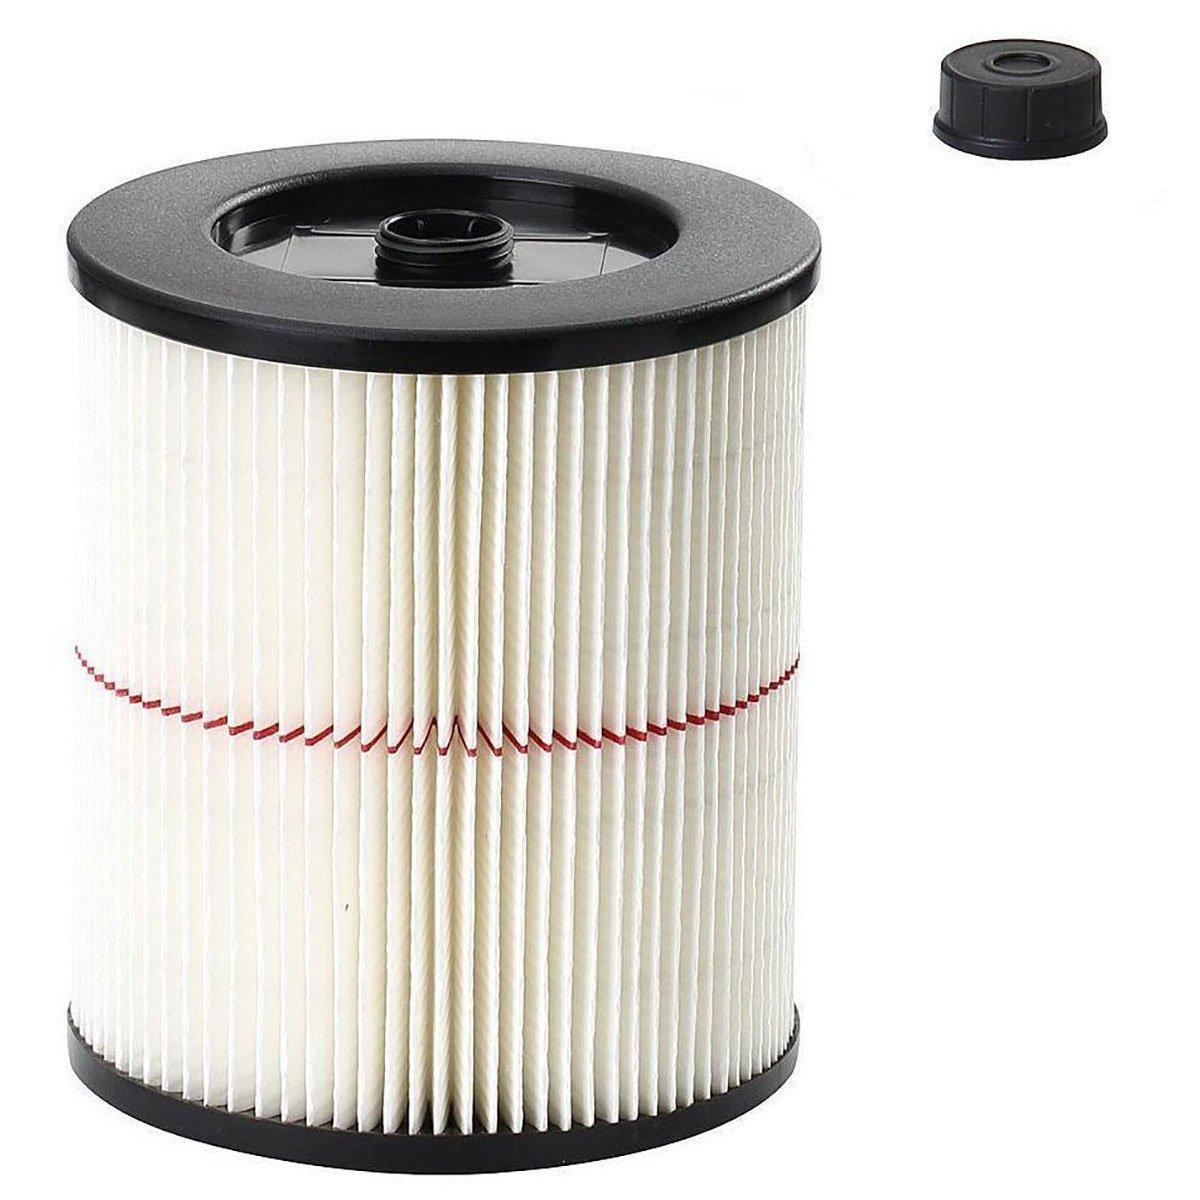 Vacfit Filter For Shop Vac Craftsman  Replacement Cartridge Filter For Craftsman